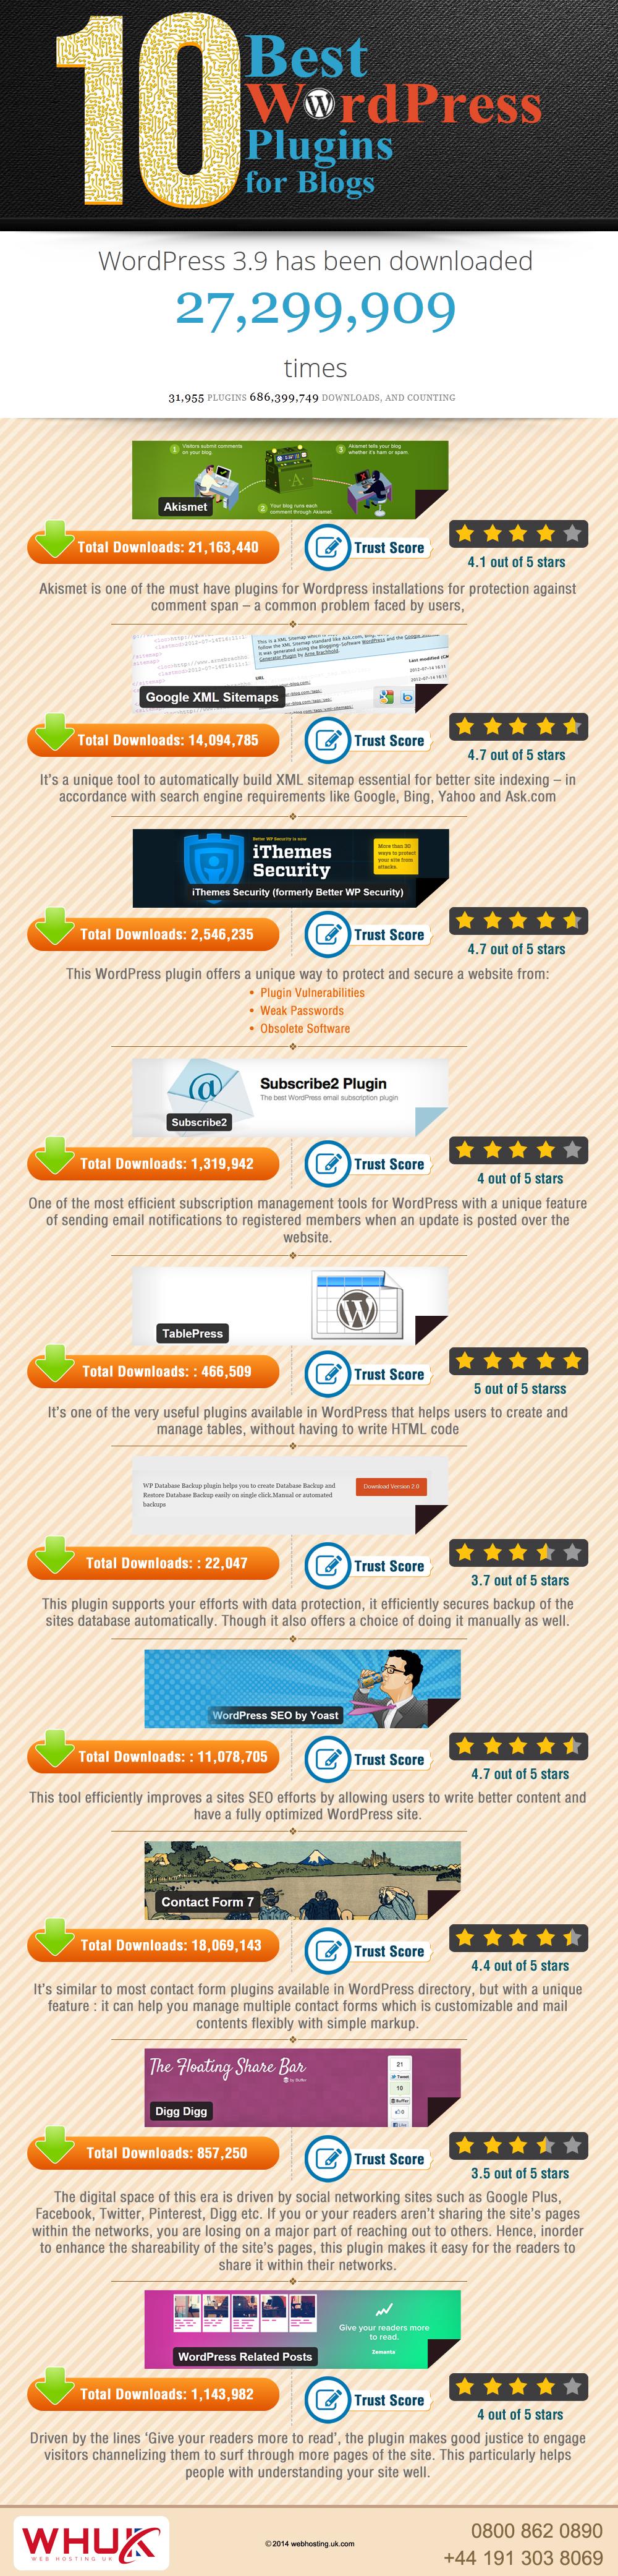 Top WordPress Plugins for Blogs